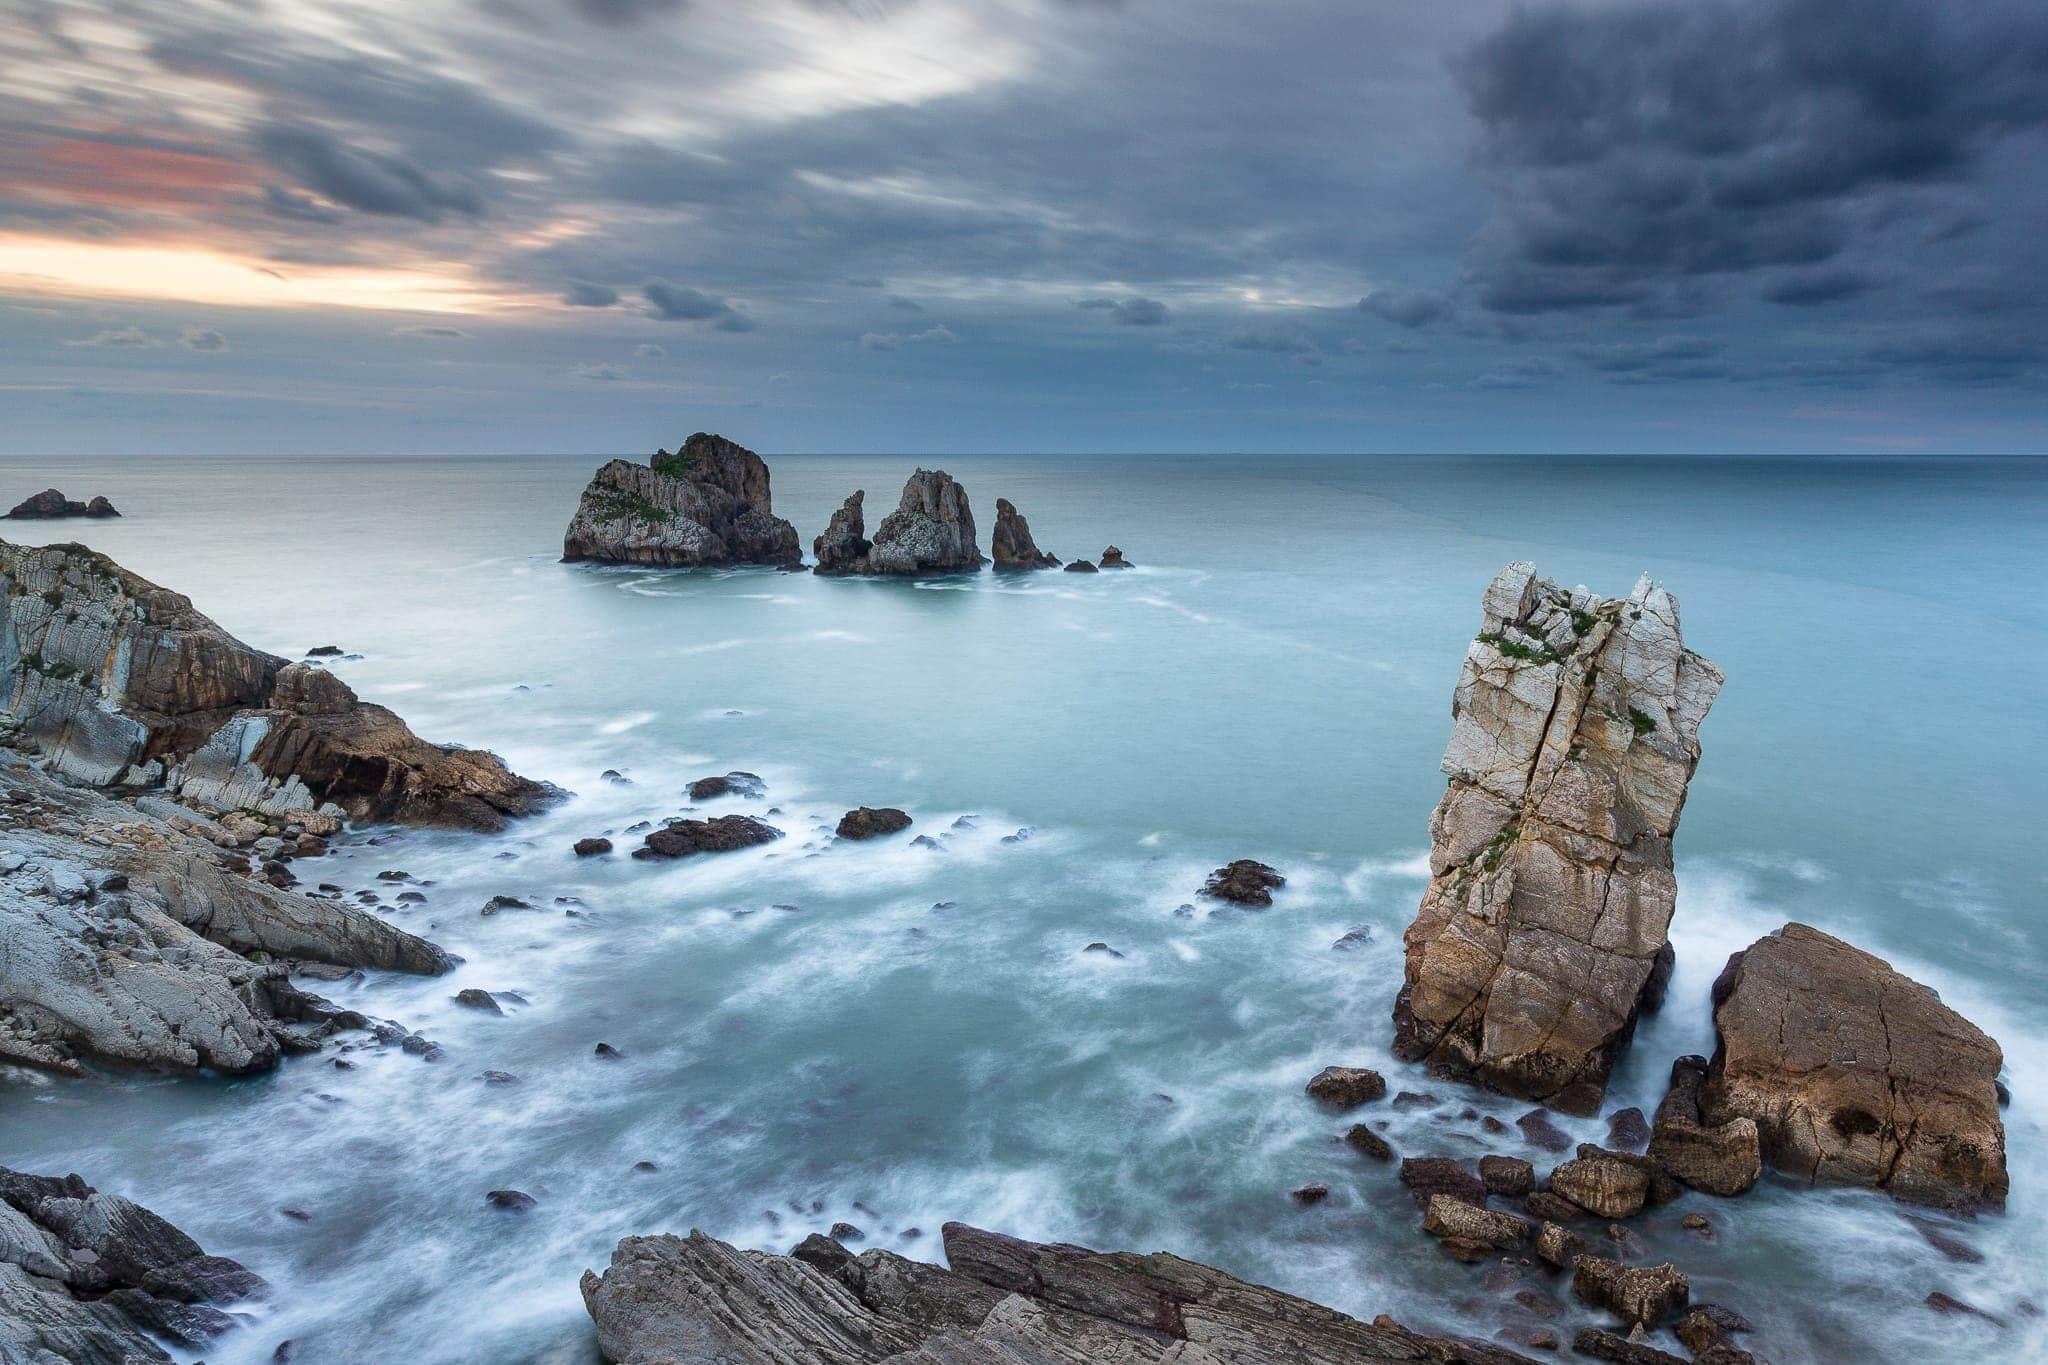 Francesco Gola Seascape Landscape Photography Costa Liencres Quebrada Santander Long Exposure